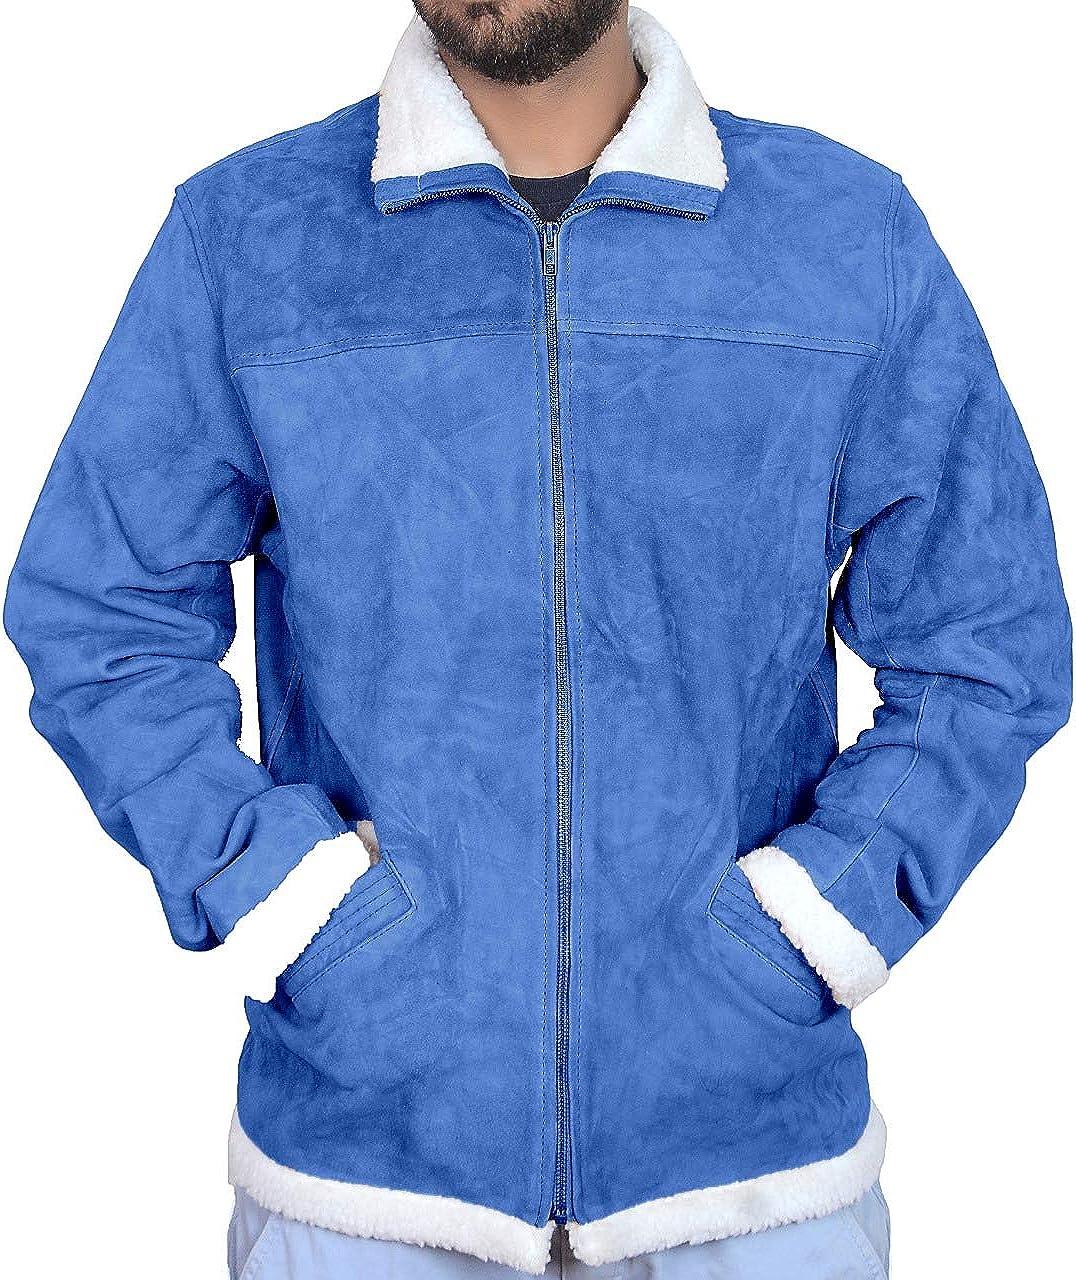 Classyak Men's Fashion Leather Jacket Furr Collar